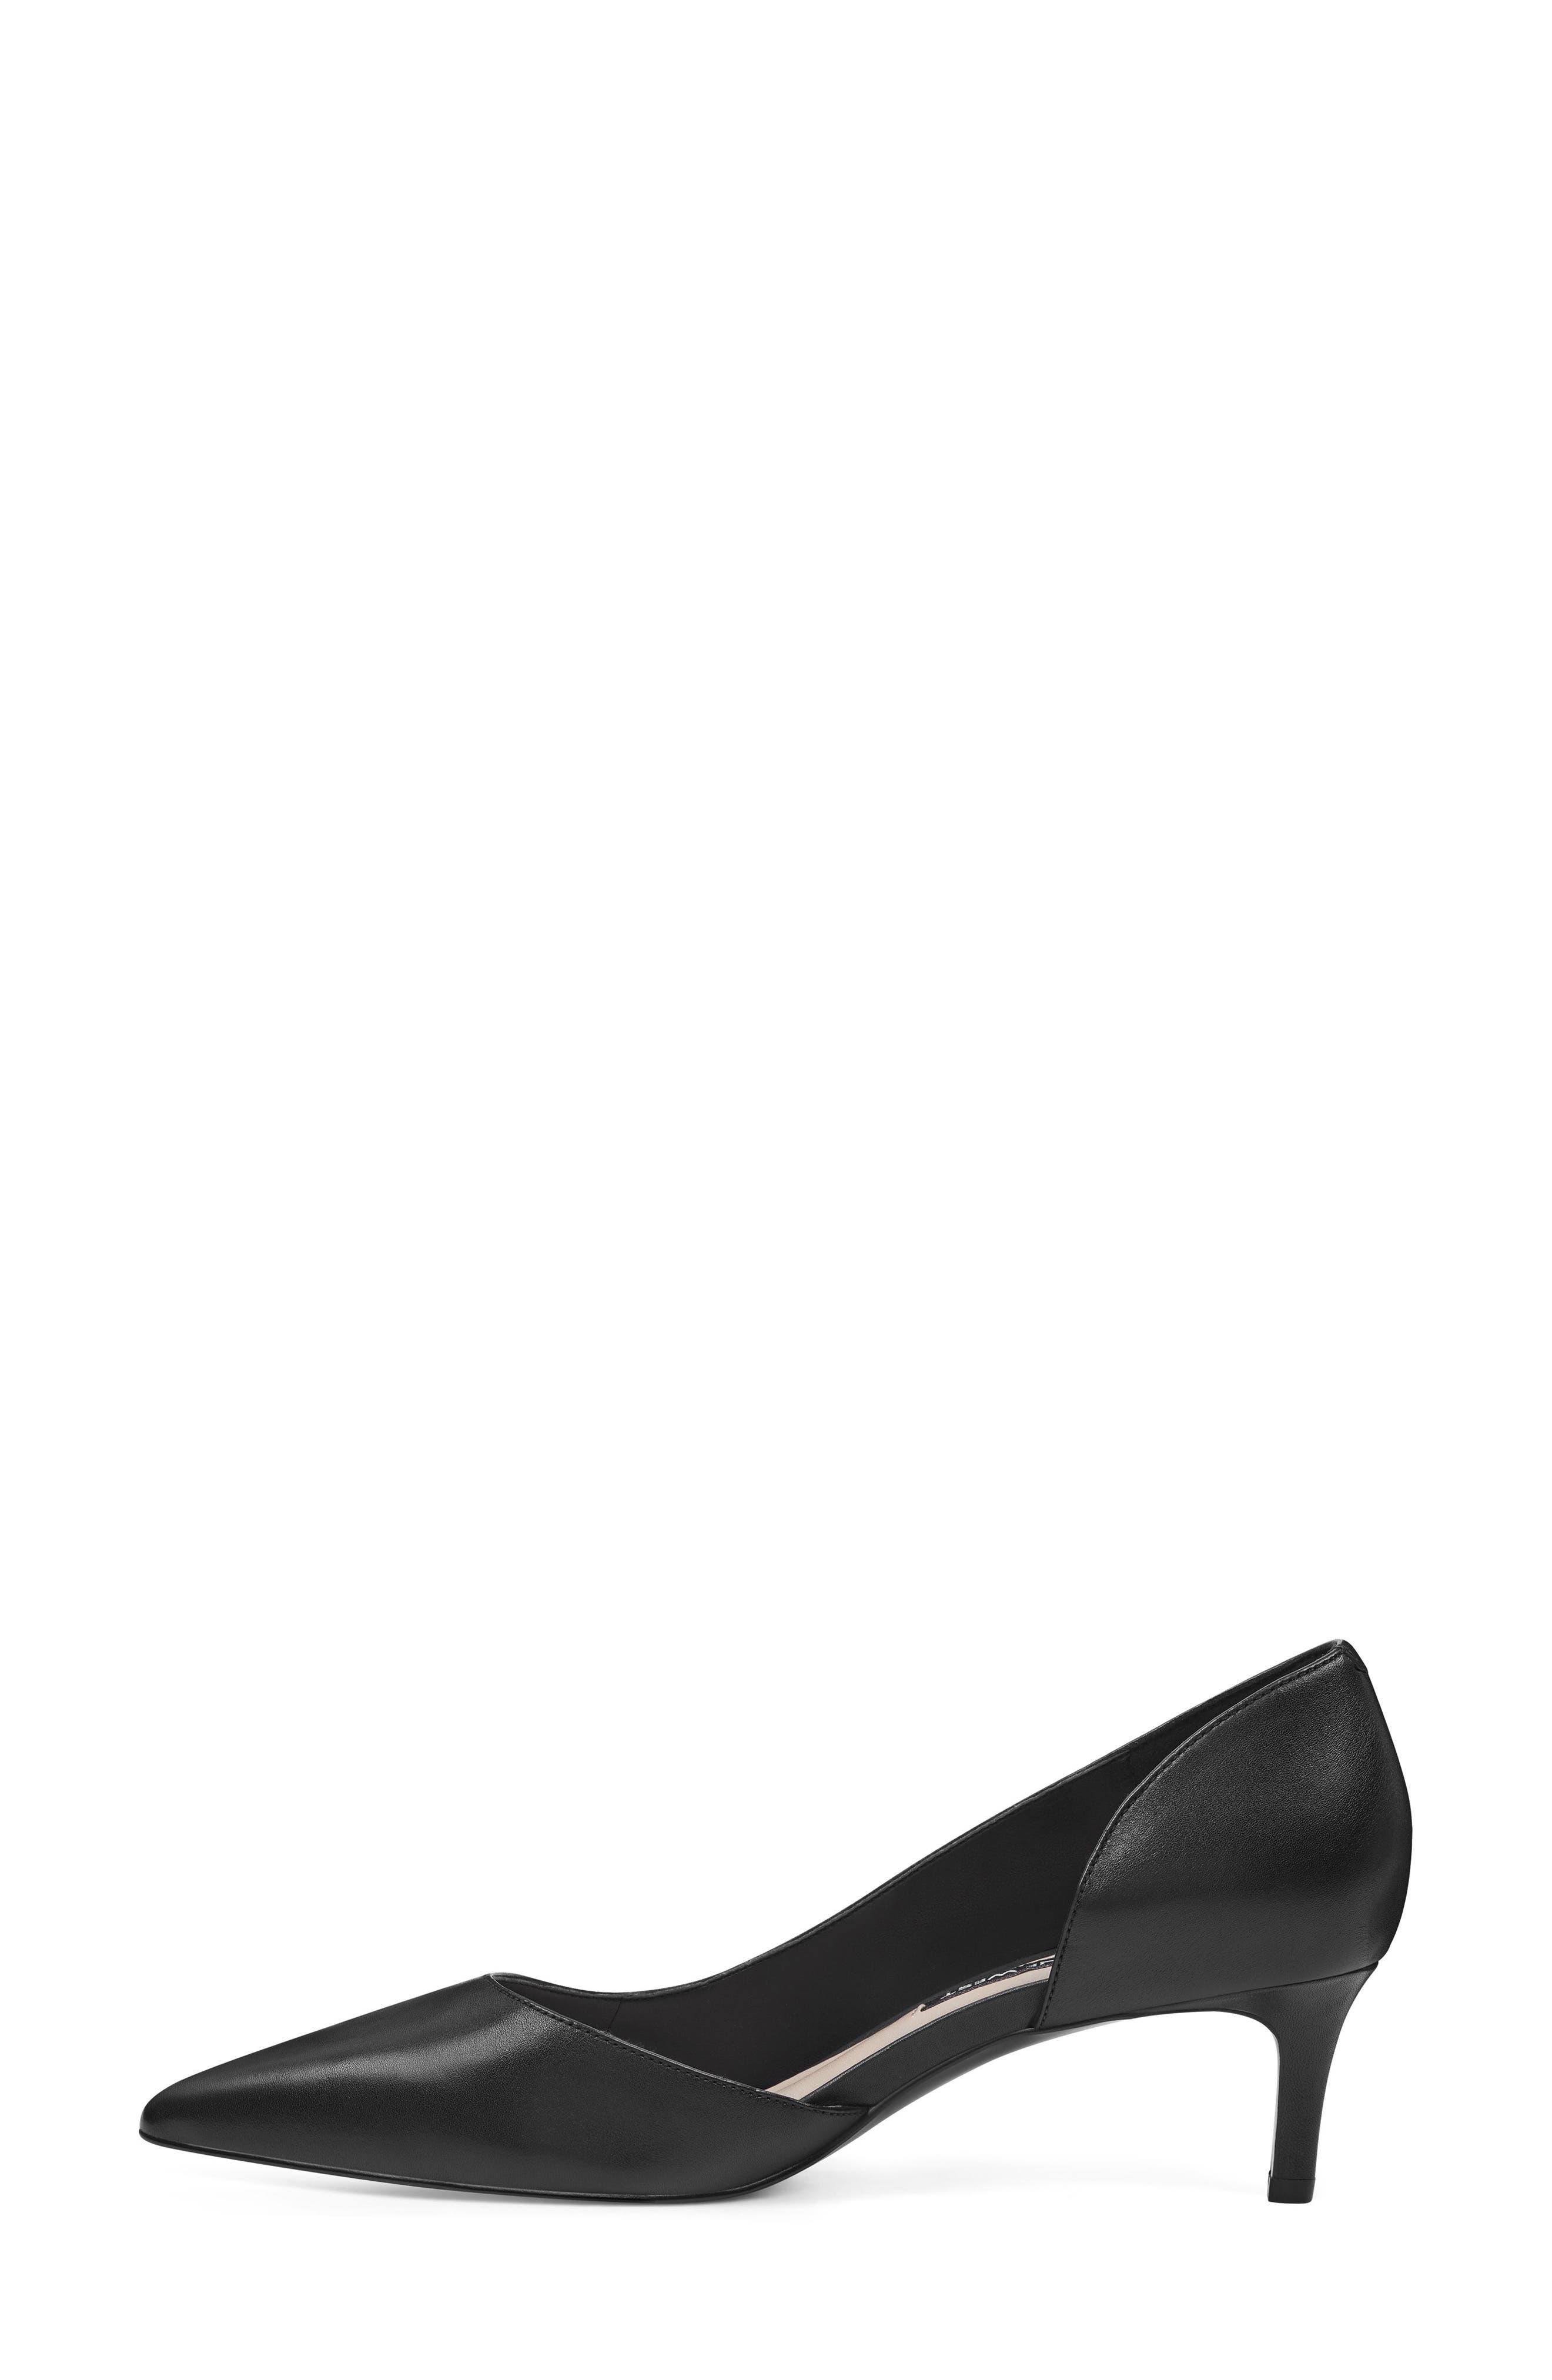 NINE WEST, Fiacre Half d'Orsay Pump, Alternate thumbnail 10, color, BLACK LEATHER